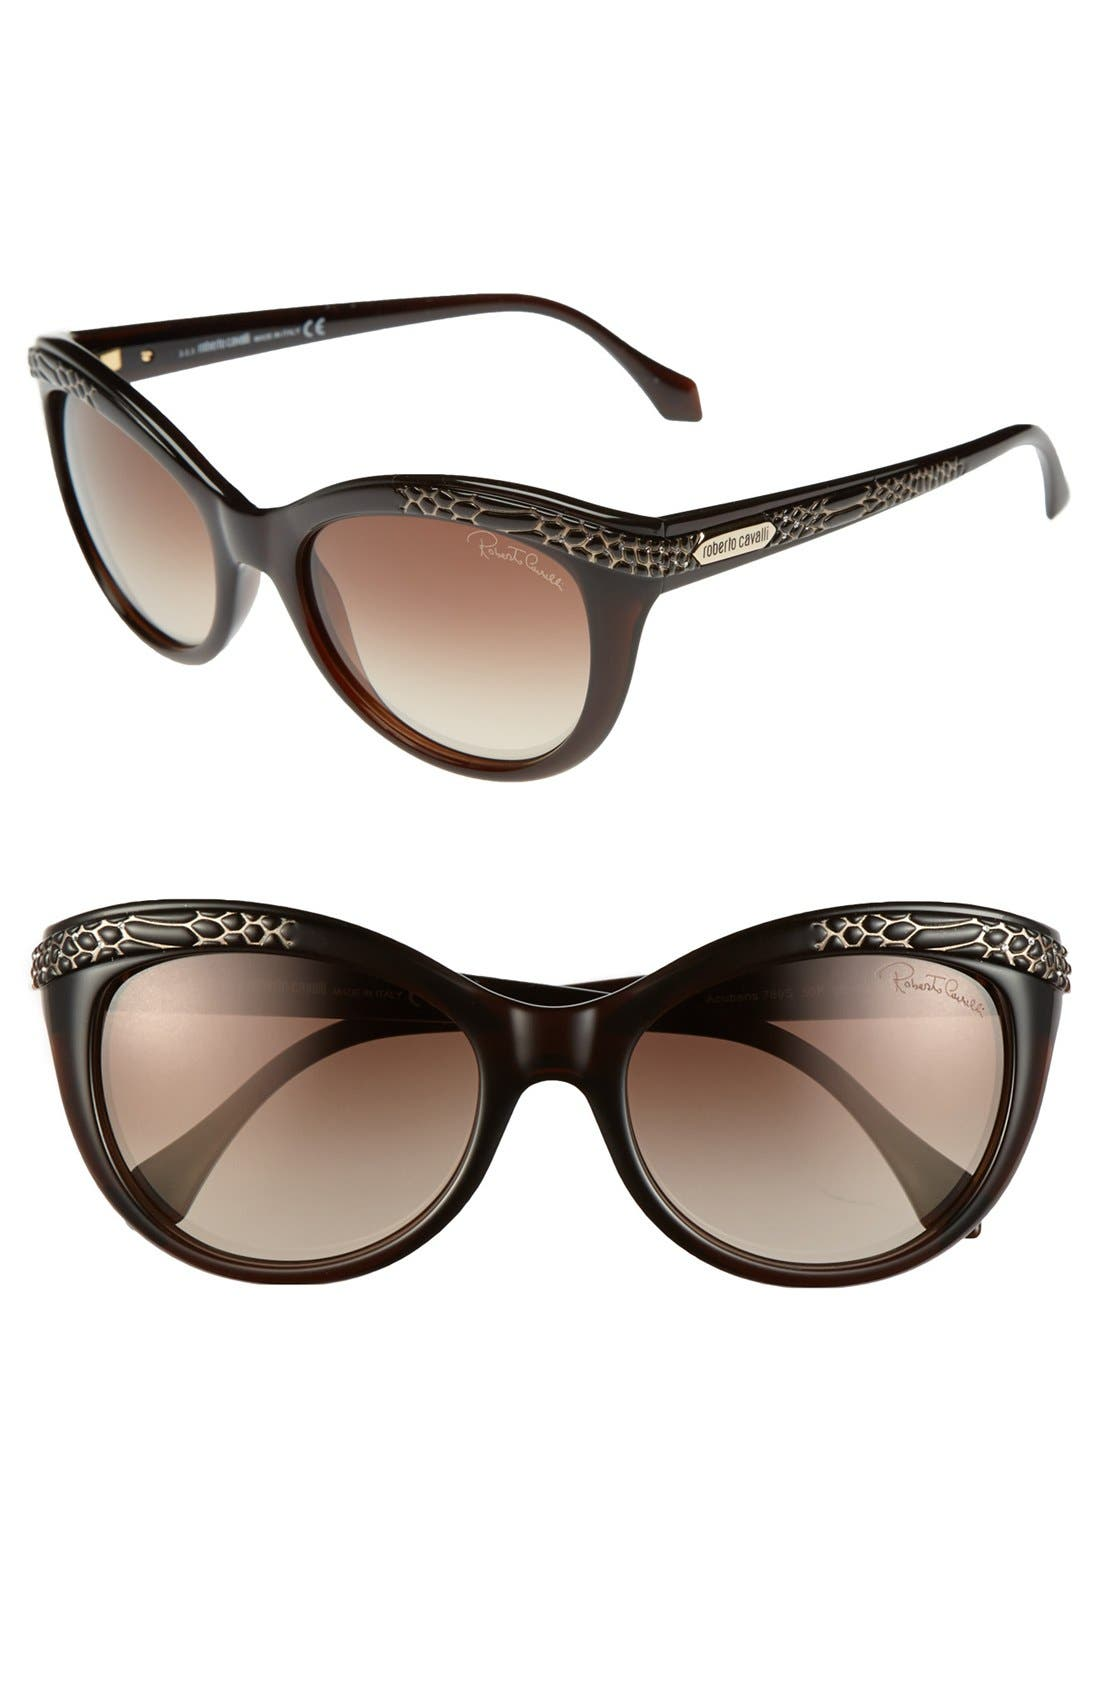 Main Image - Roberto Cavalli 'Acubens' 56mm Sunglasses